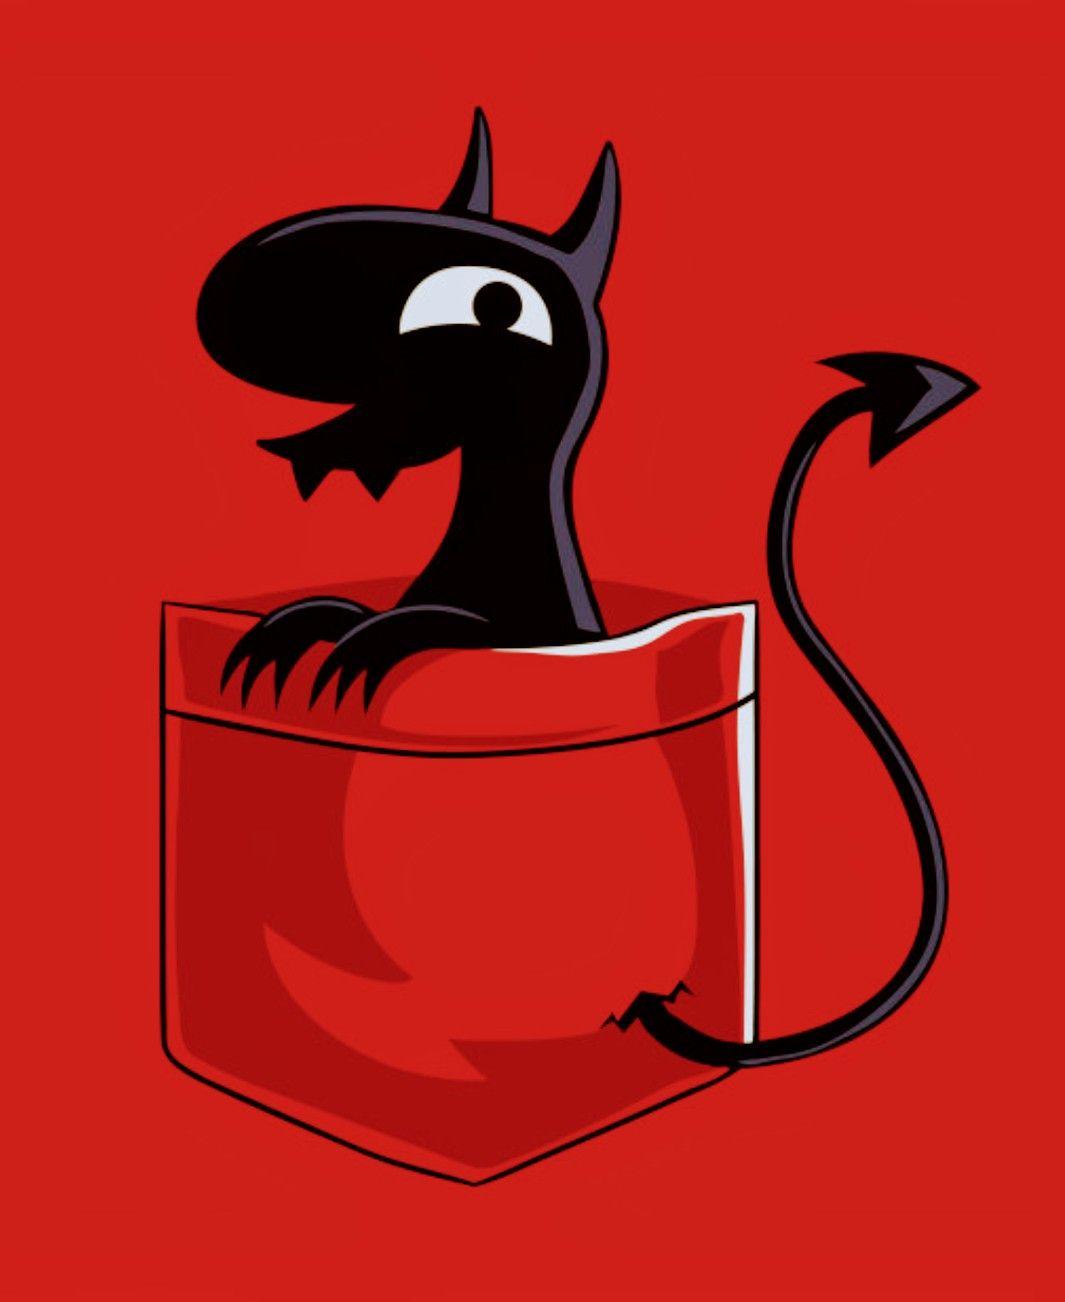 Luci - Personal Pocket Demon, Disenchantment #luci